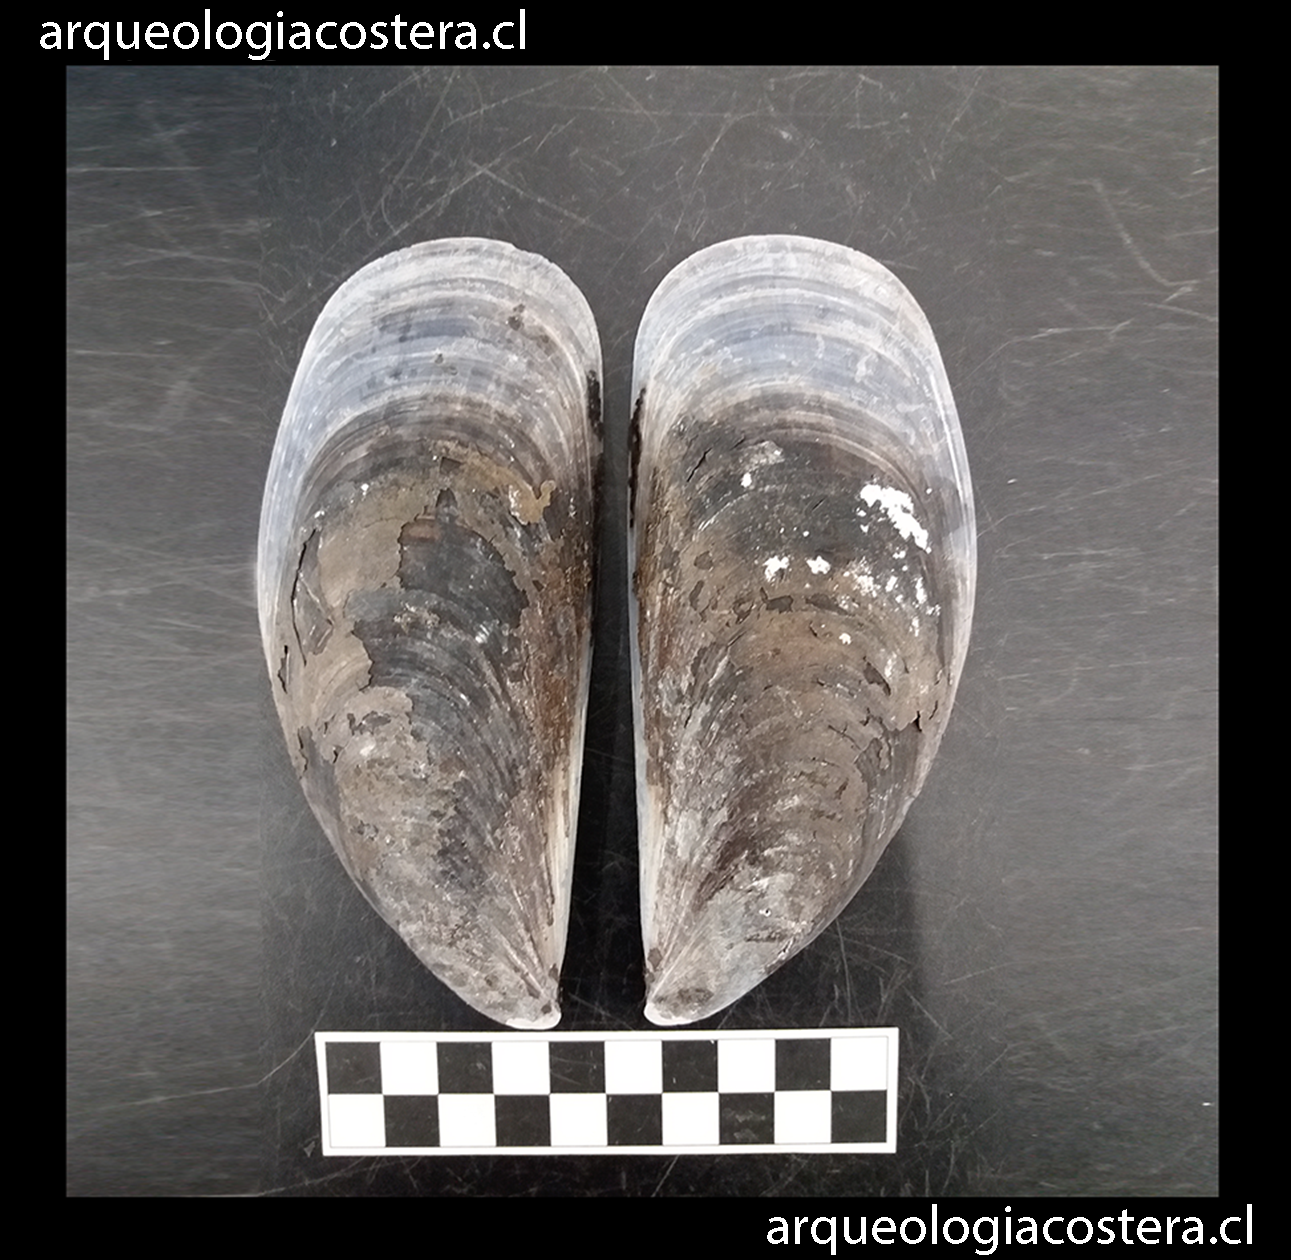 Concha de Choromytilus chorus